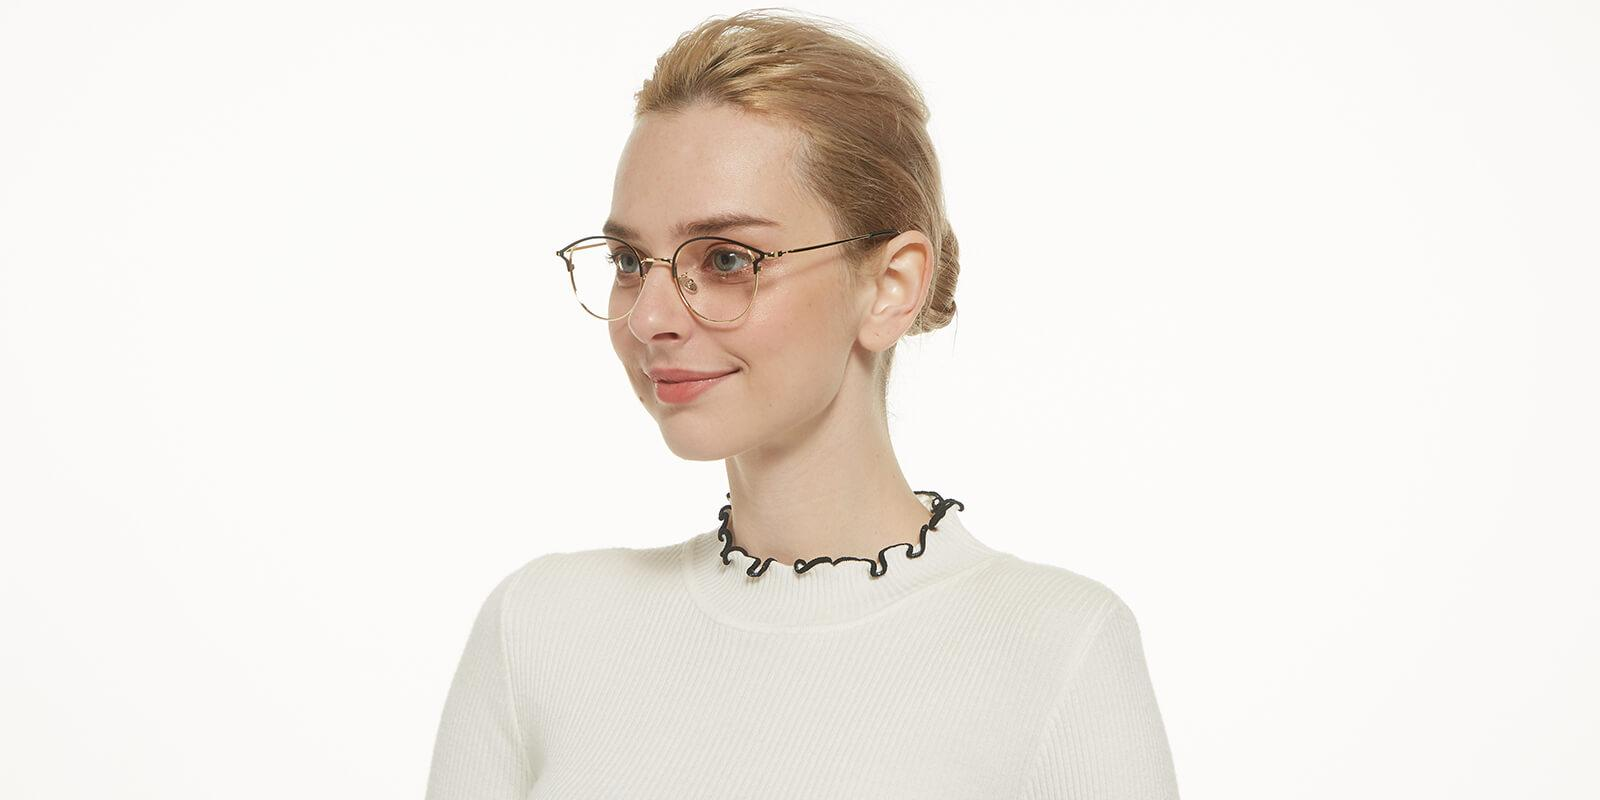 Brace-Gold-Browline-Metal-Eyeglasses-additional5